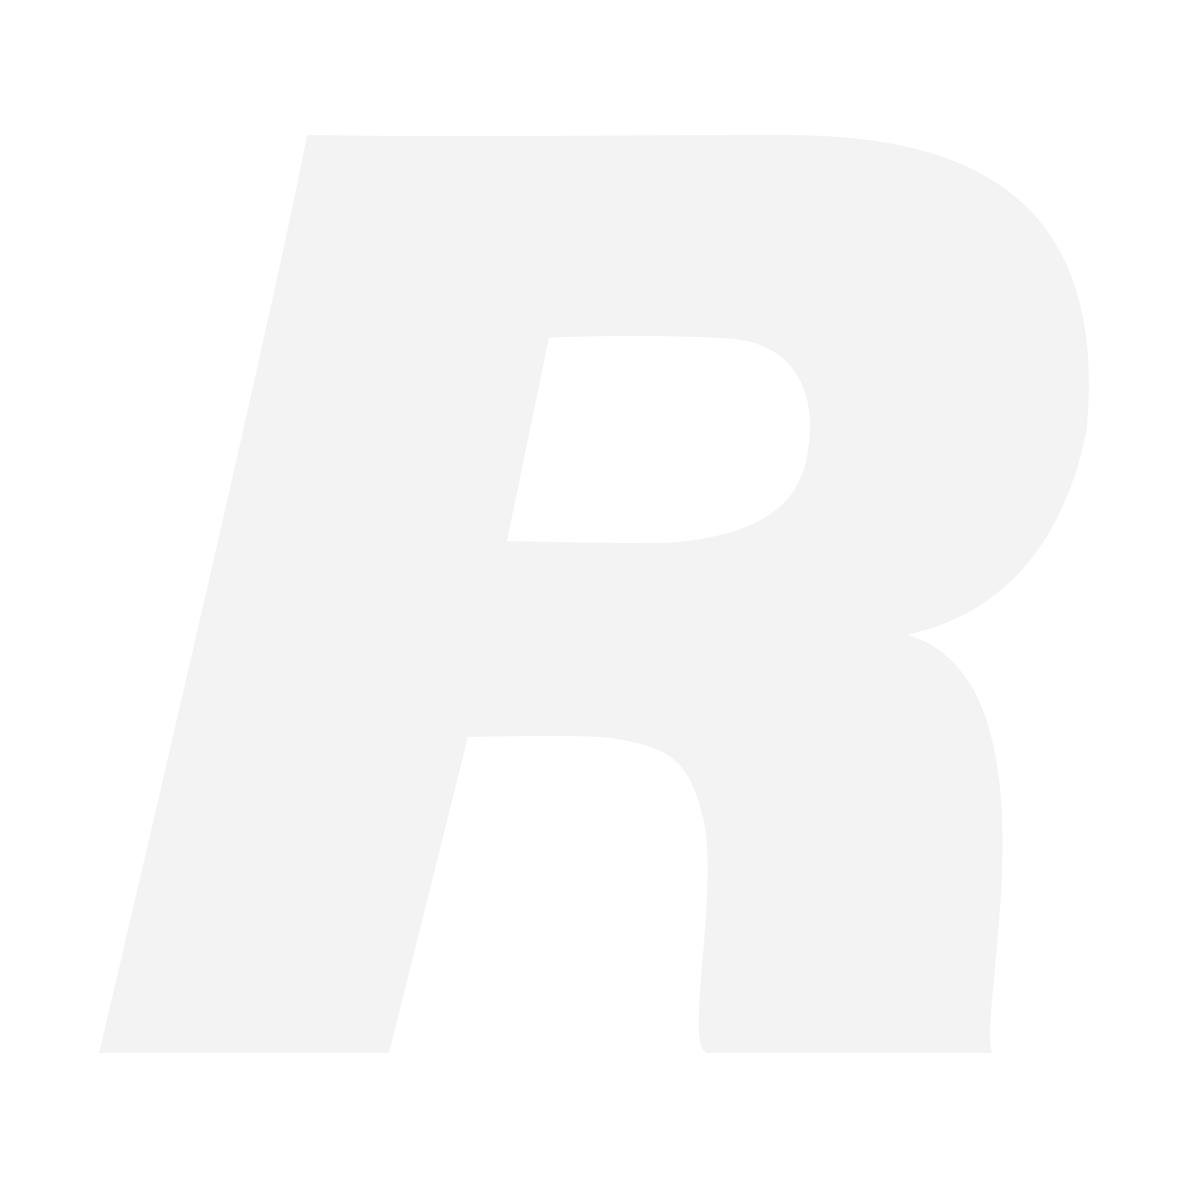 Köp Sony A7R Mark III, byt in din gamla Sony A7R